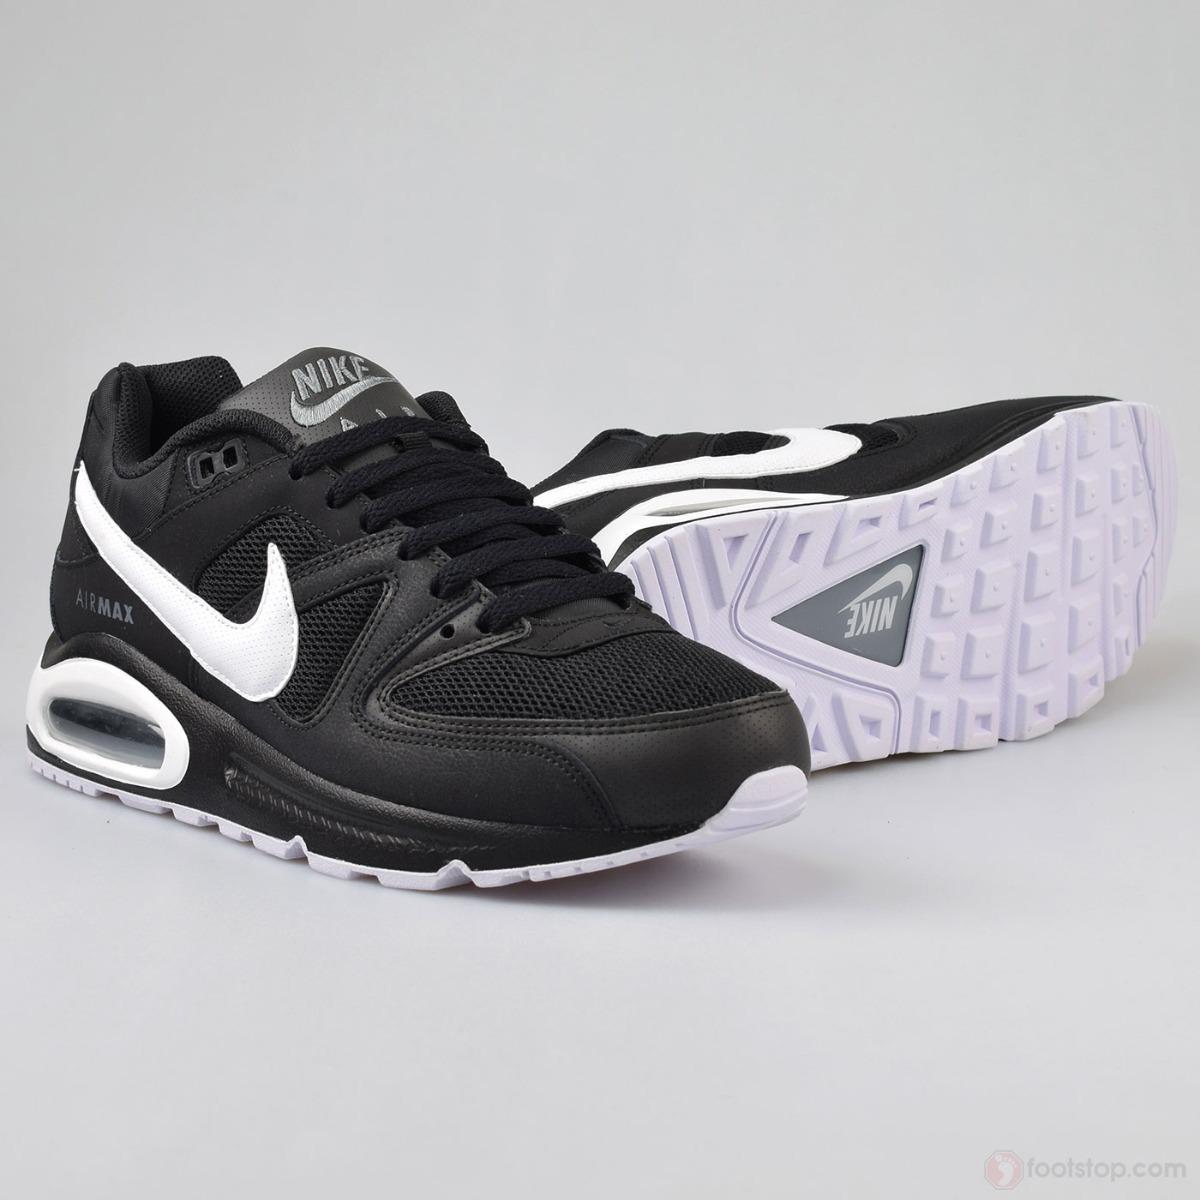 Tenis Nike Air Max Command Negro 100% Originales 629993 032.